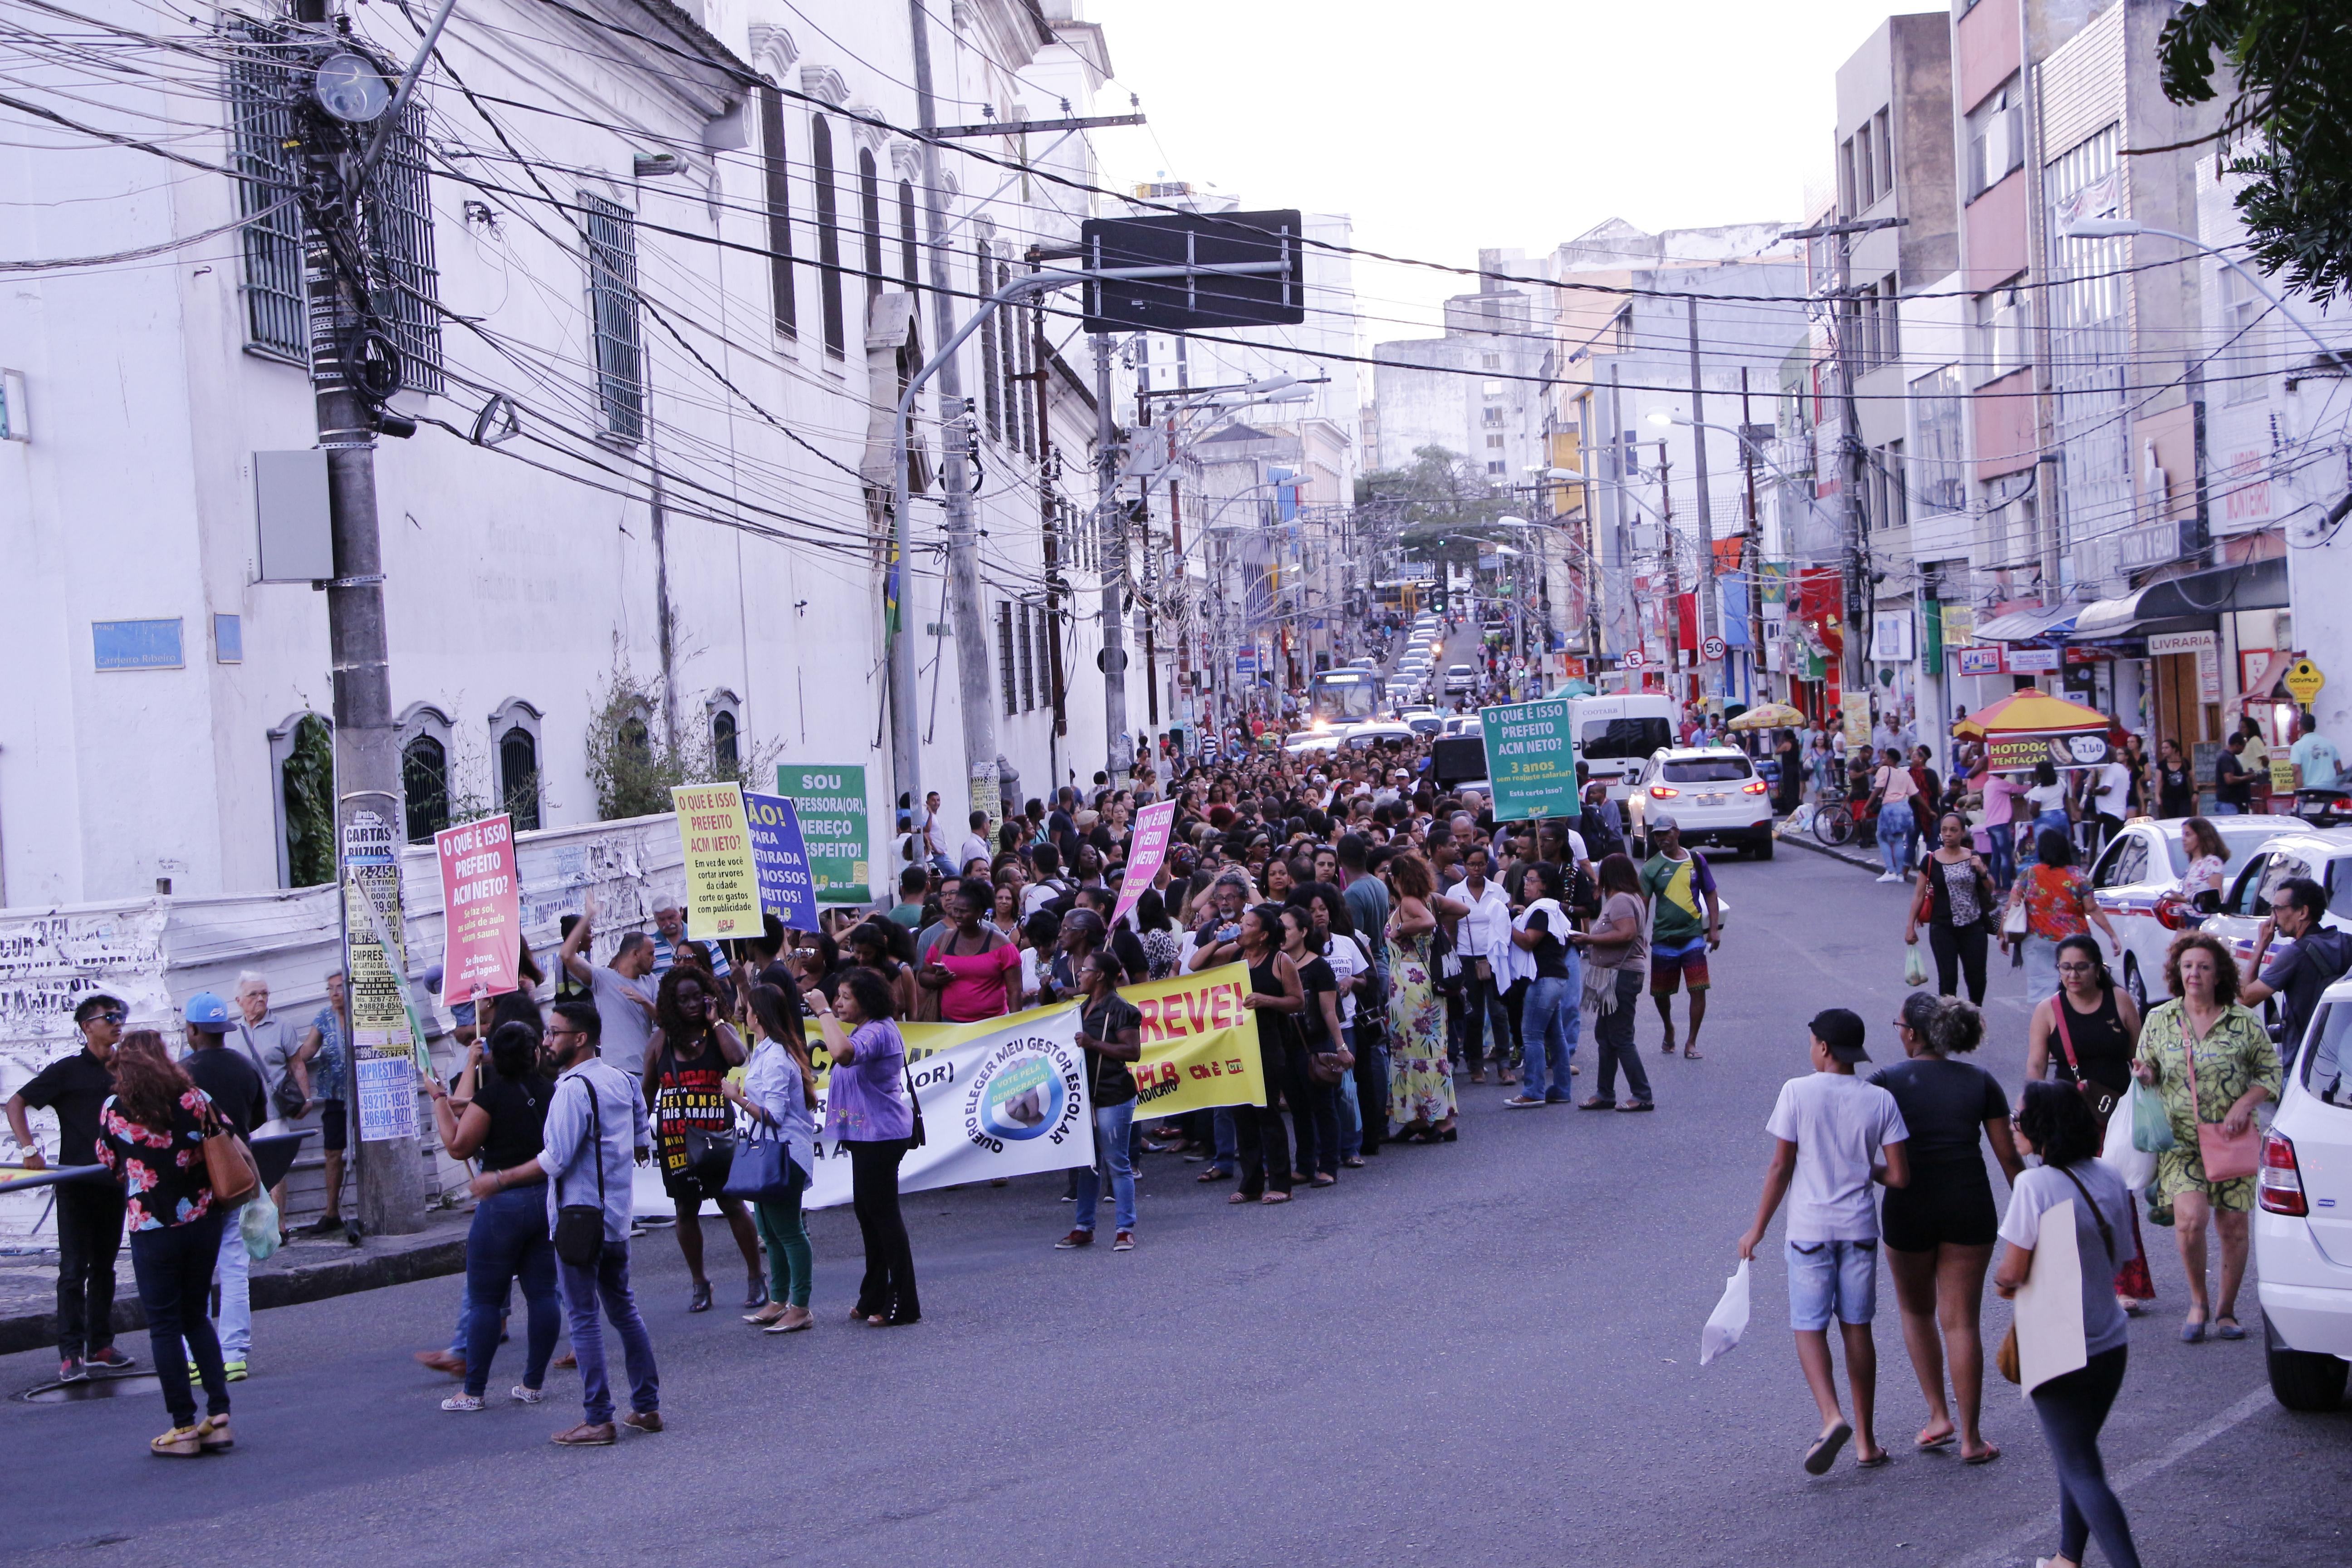 aplb sindicato greve salvador 2018